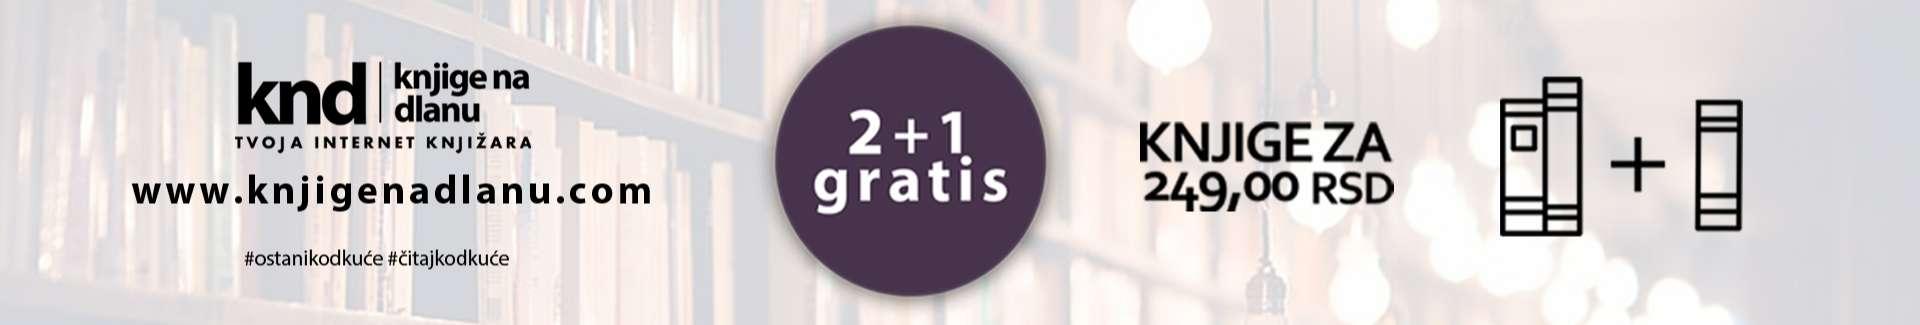 Knjige za 249rsd 2+1 gratis – Slider